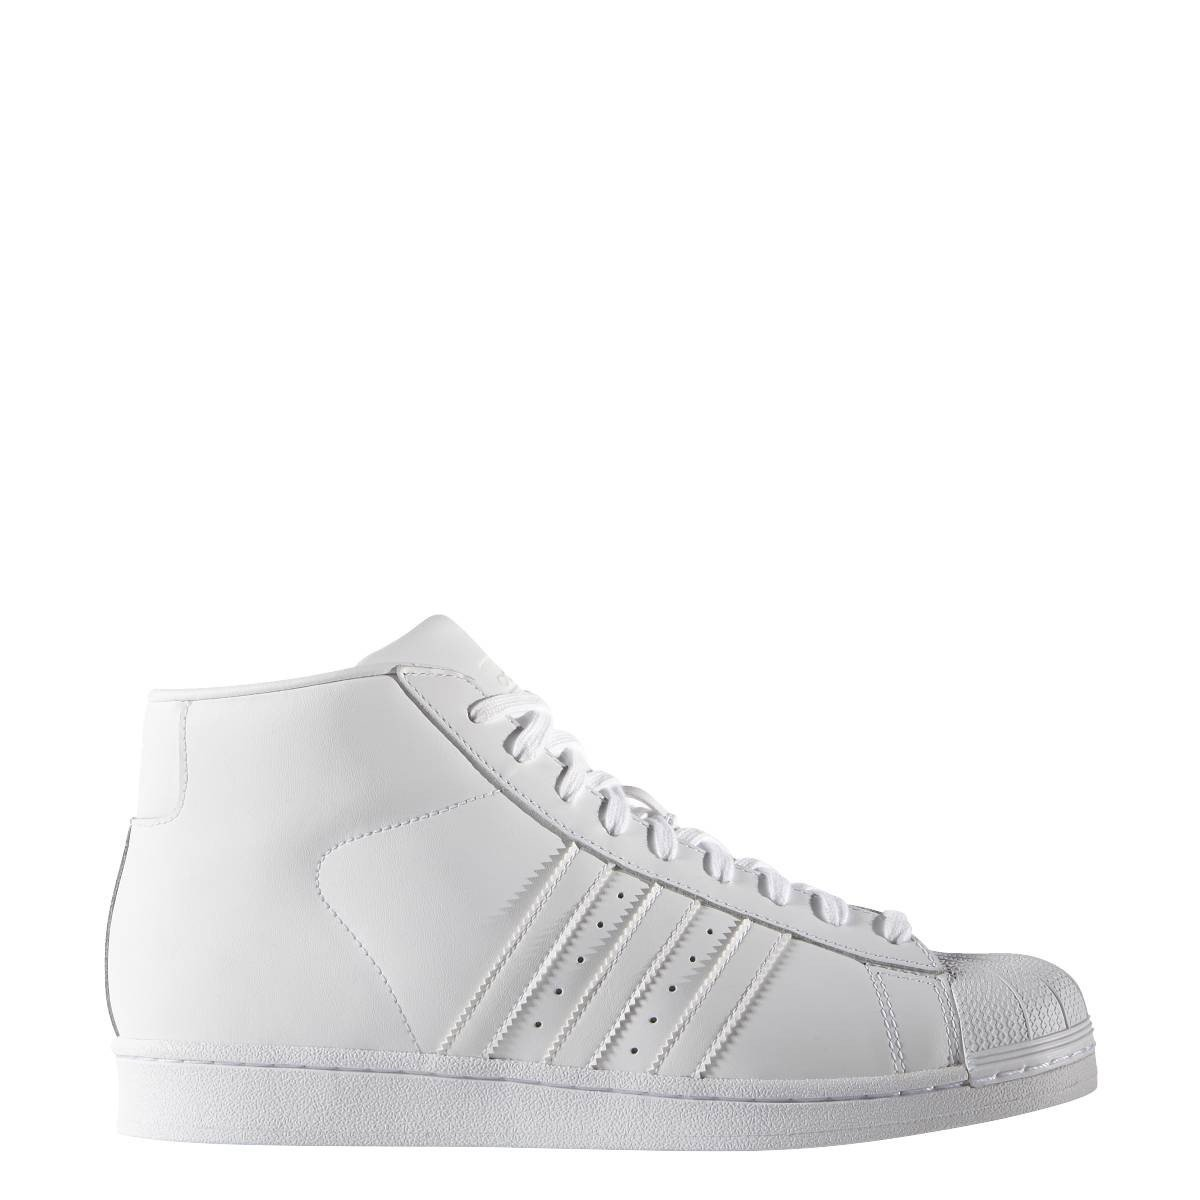 Adidas Originals Superstar Pro Model Schuhe Sneaker Sportschuhe Weiß